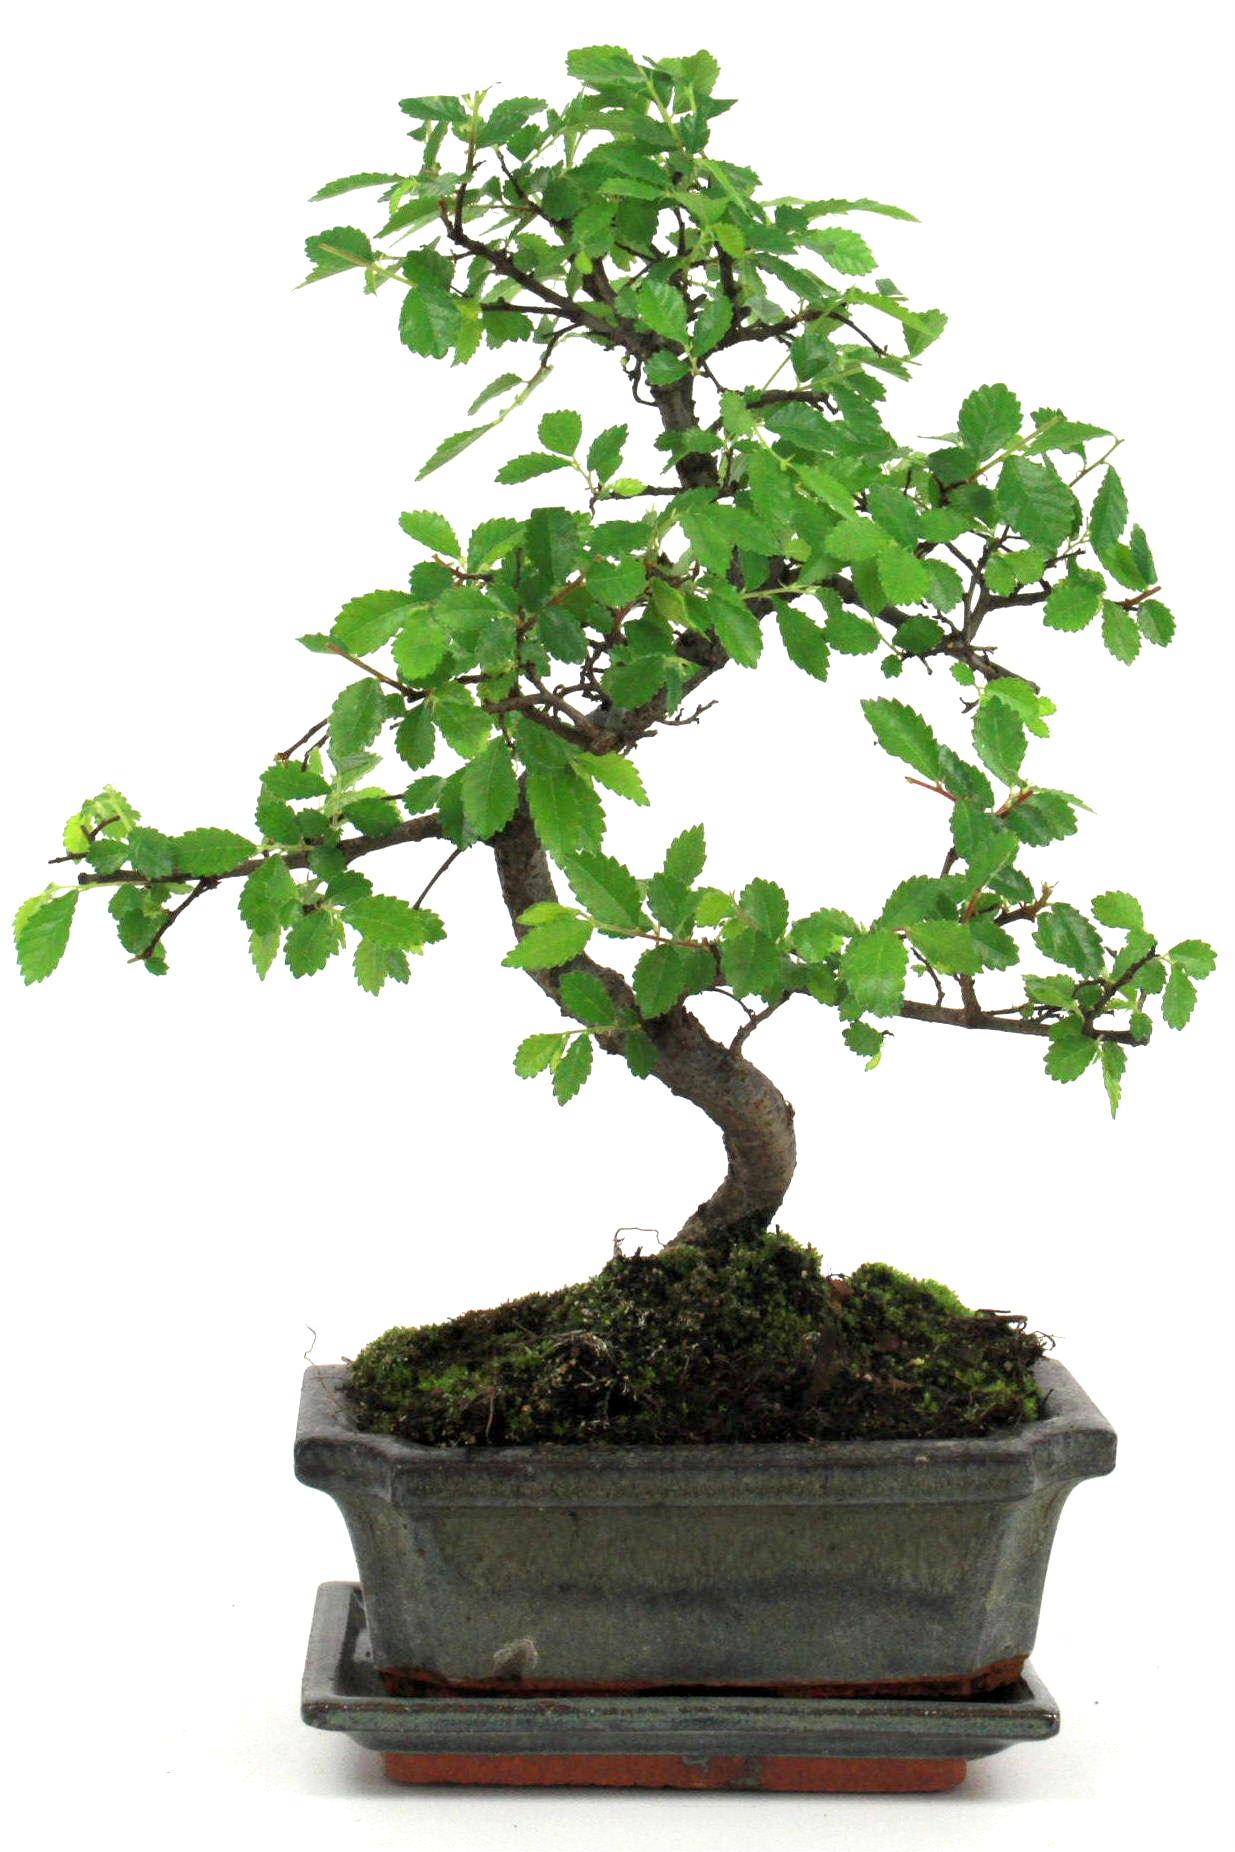 Bonsai chinesische ulme 30 35 cm g1618 bei oyaki bonsai kaufen for Bonsai onlineshop